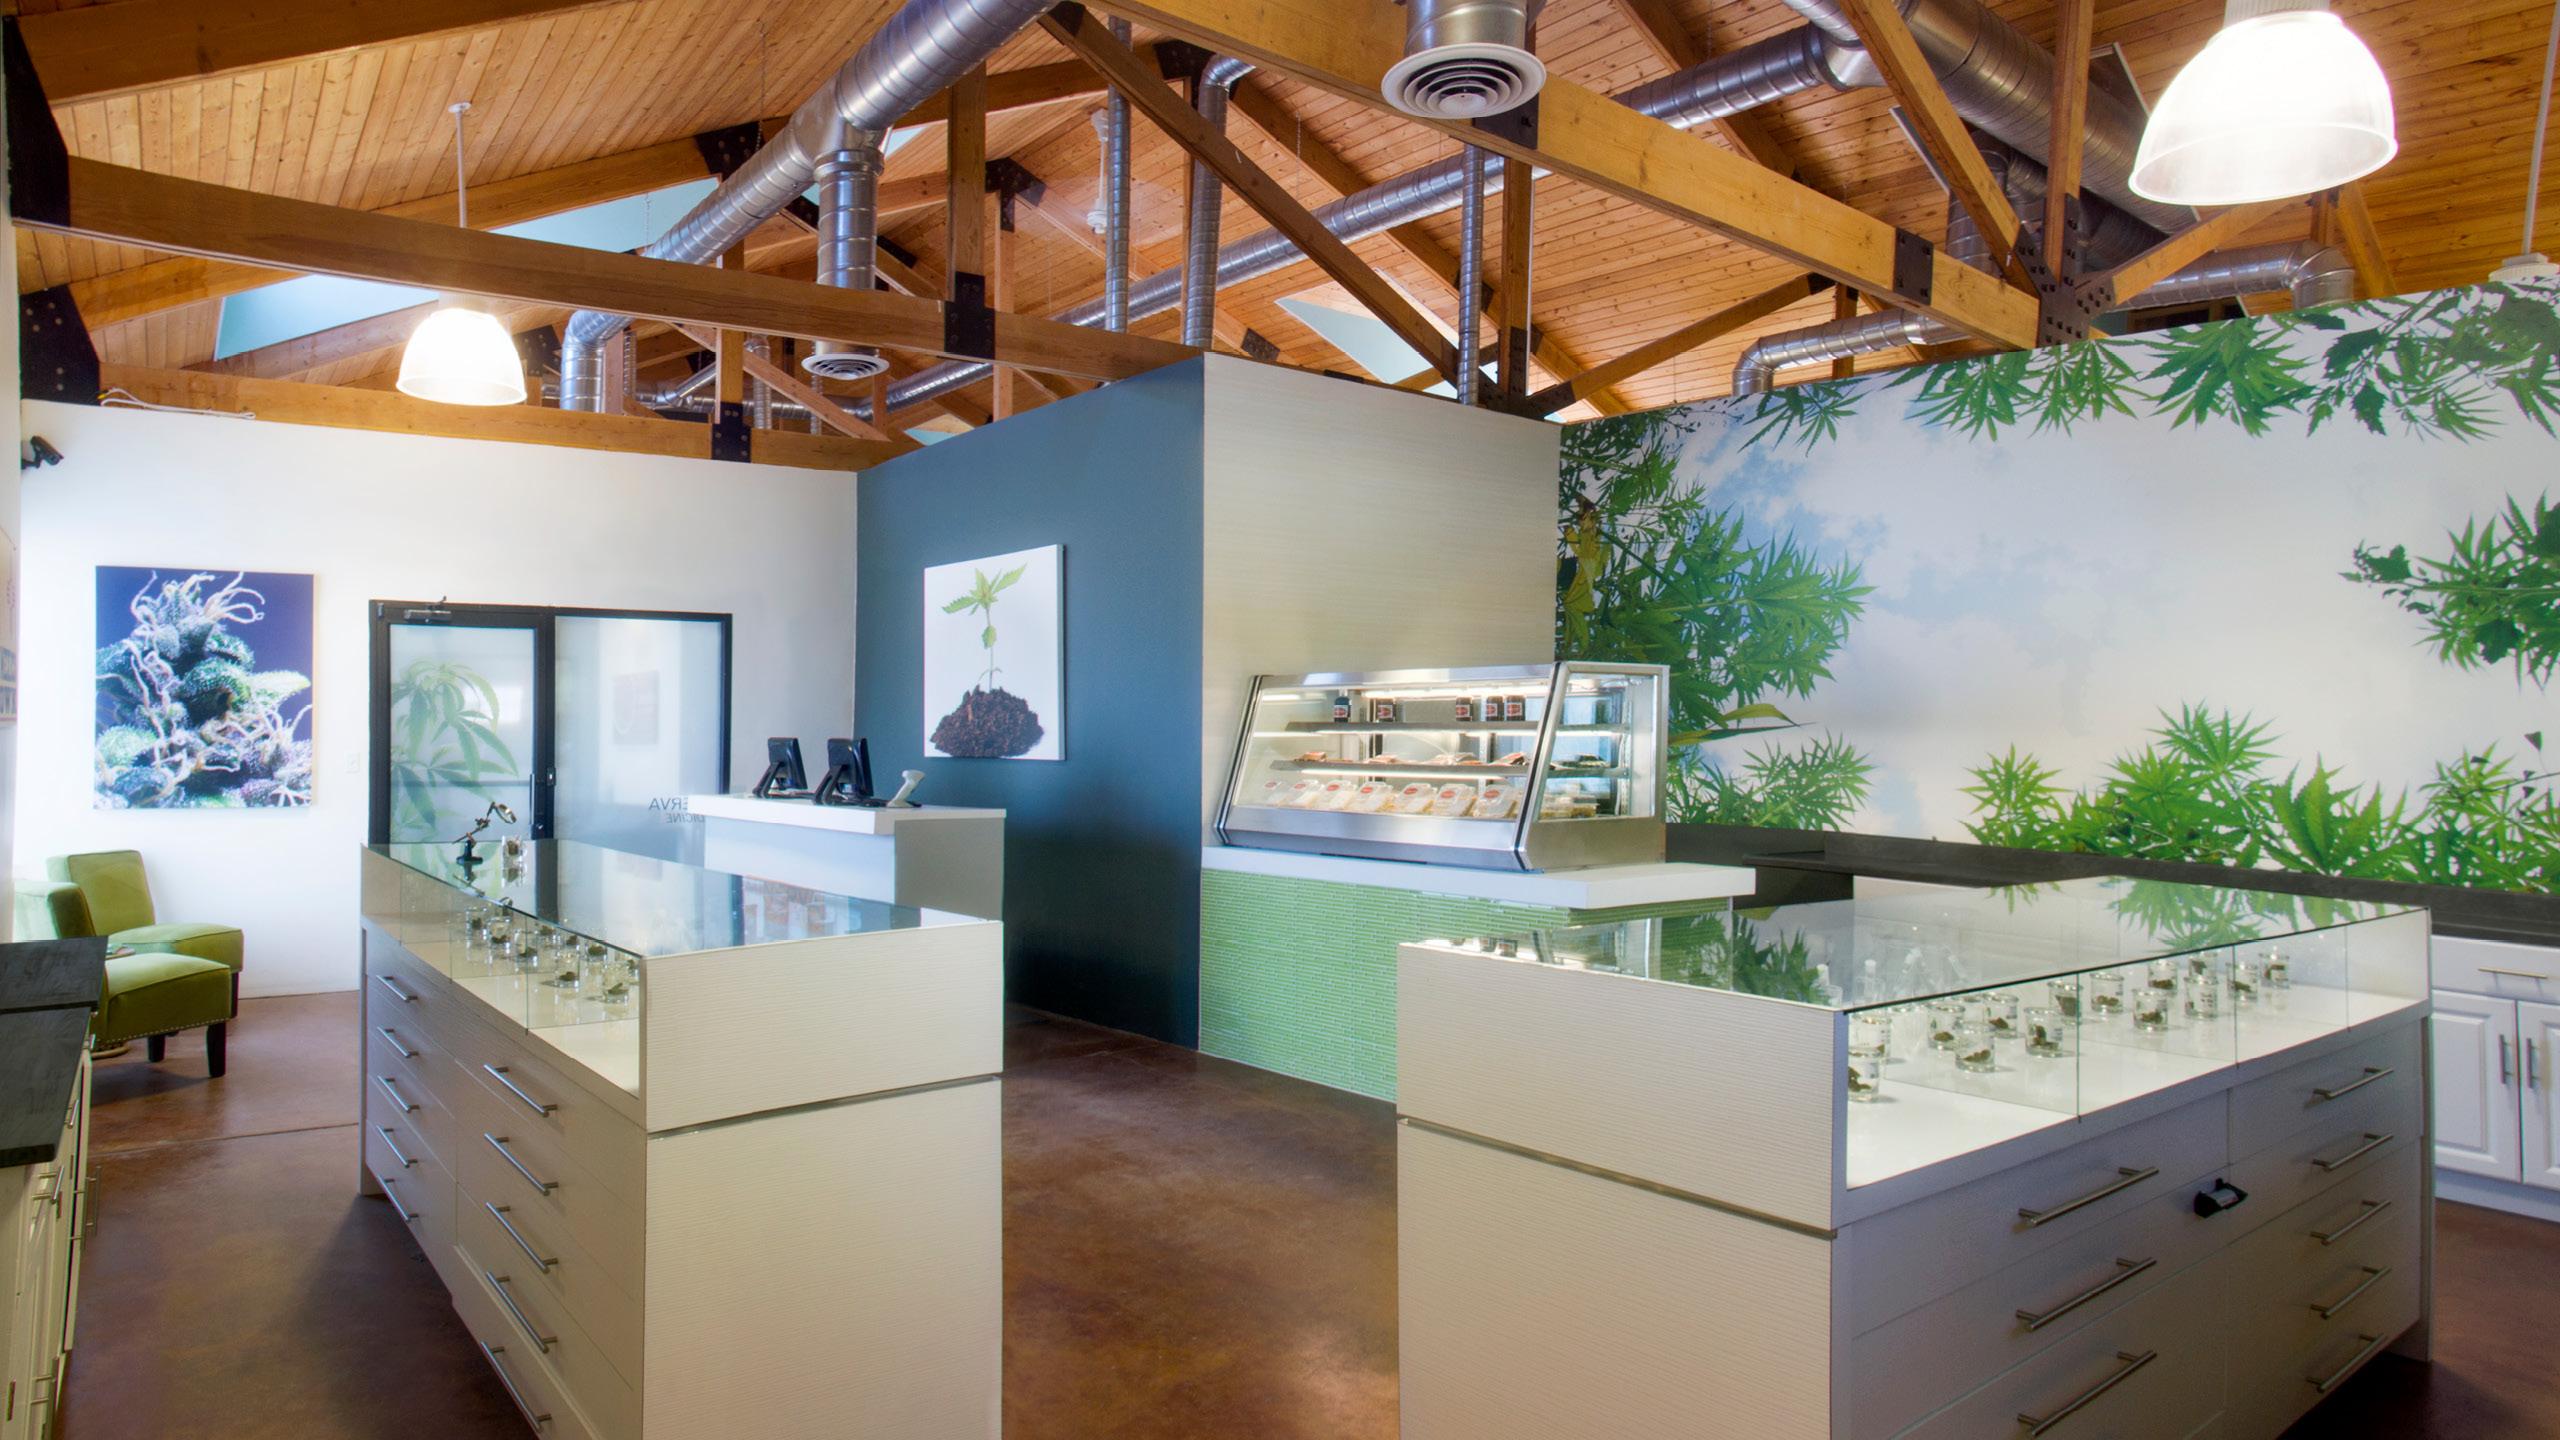 Minerva Canna Group Dispensary Retail Interior Design by High Road Design Studio